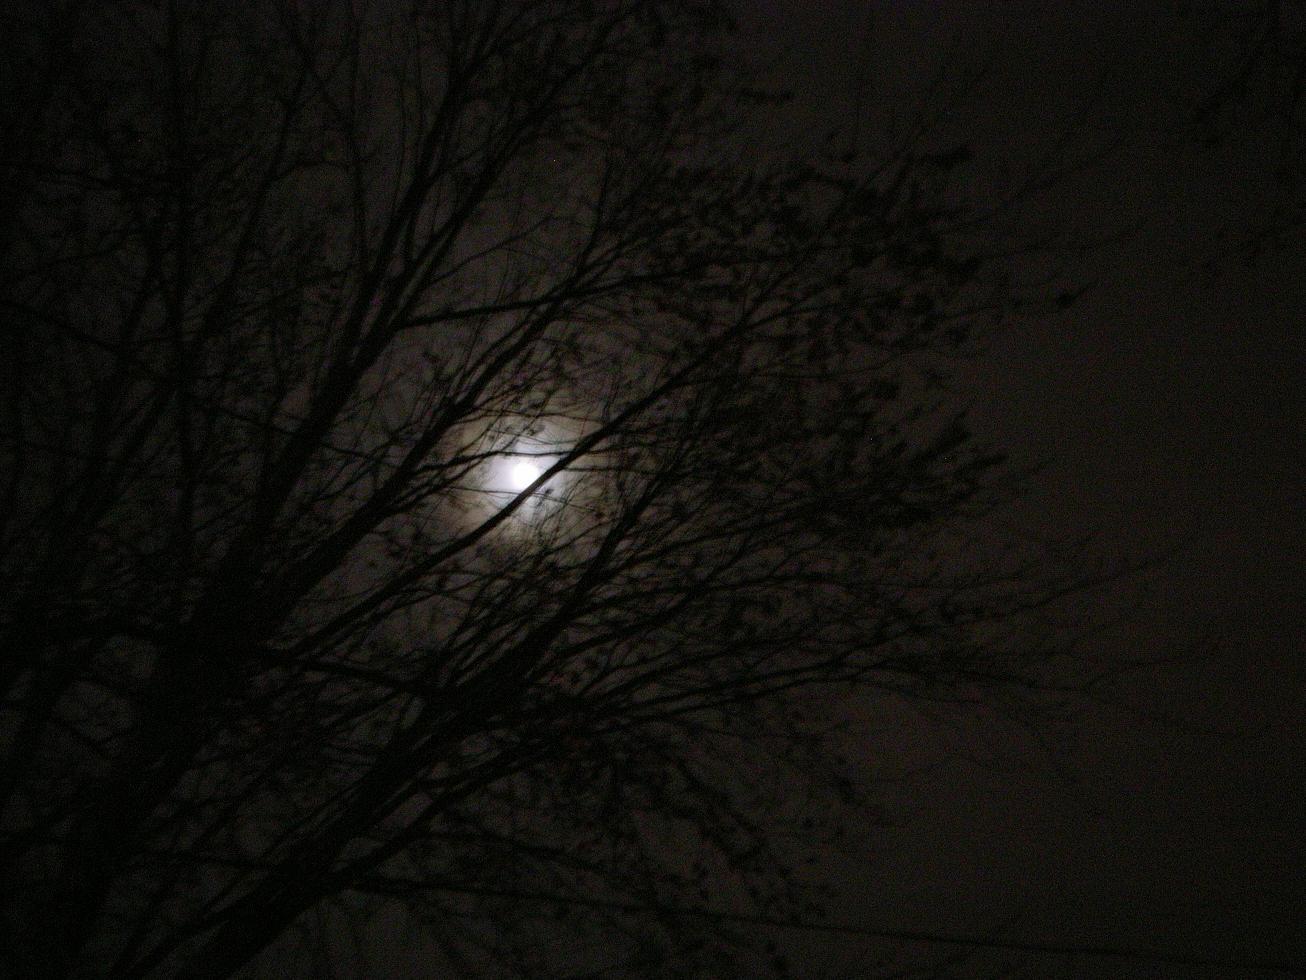 Moon Climbs A Tree by jminor in Regular Member Gallery